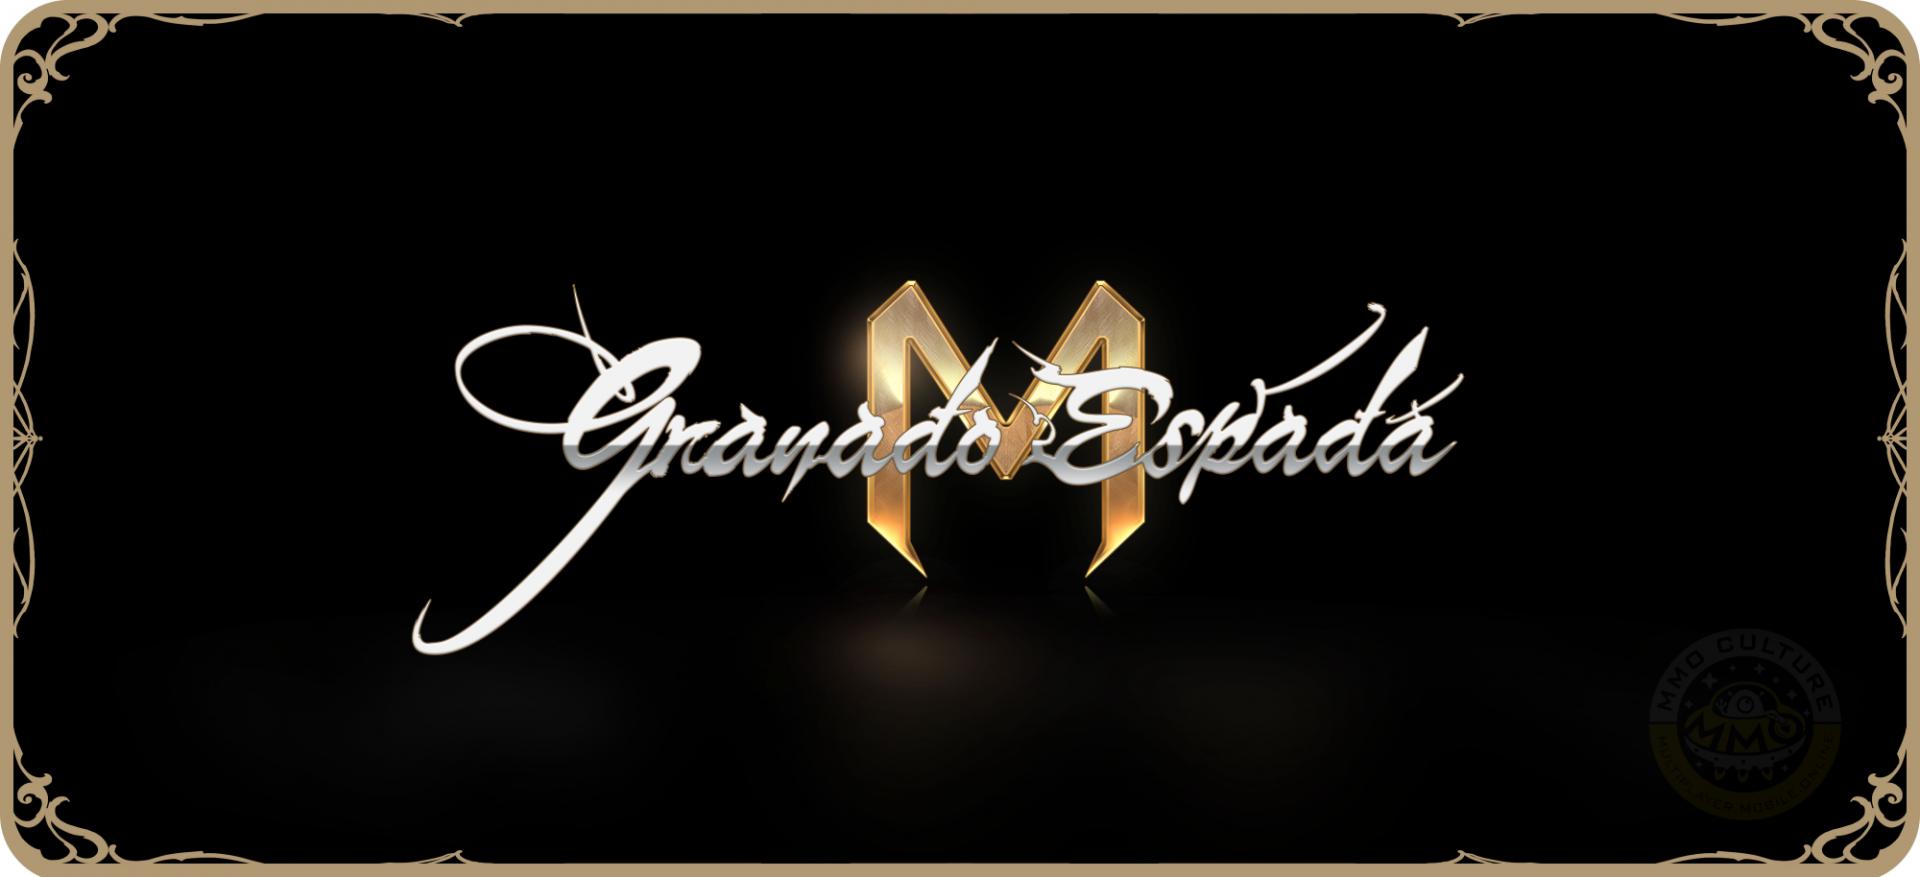 Granado Espada 642020 2